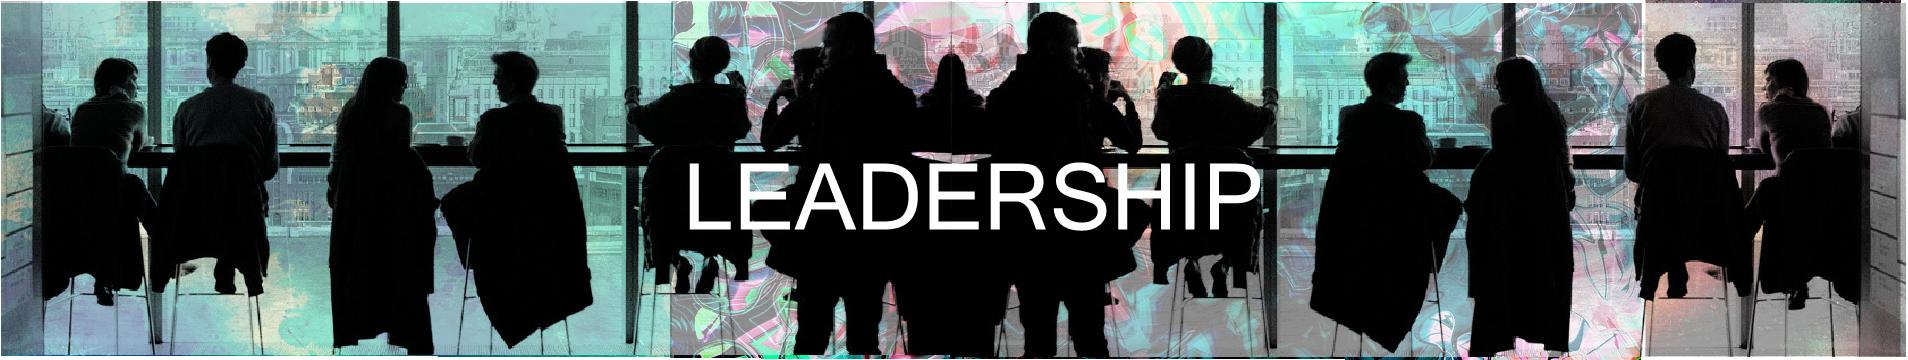 Leadership Banner 4 Stone Bond Technologies